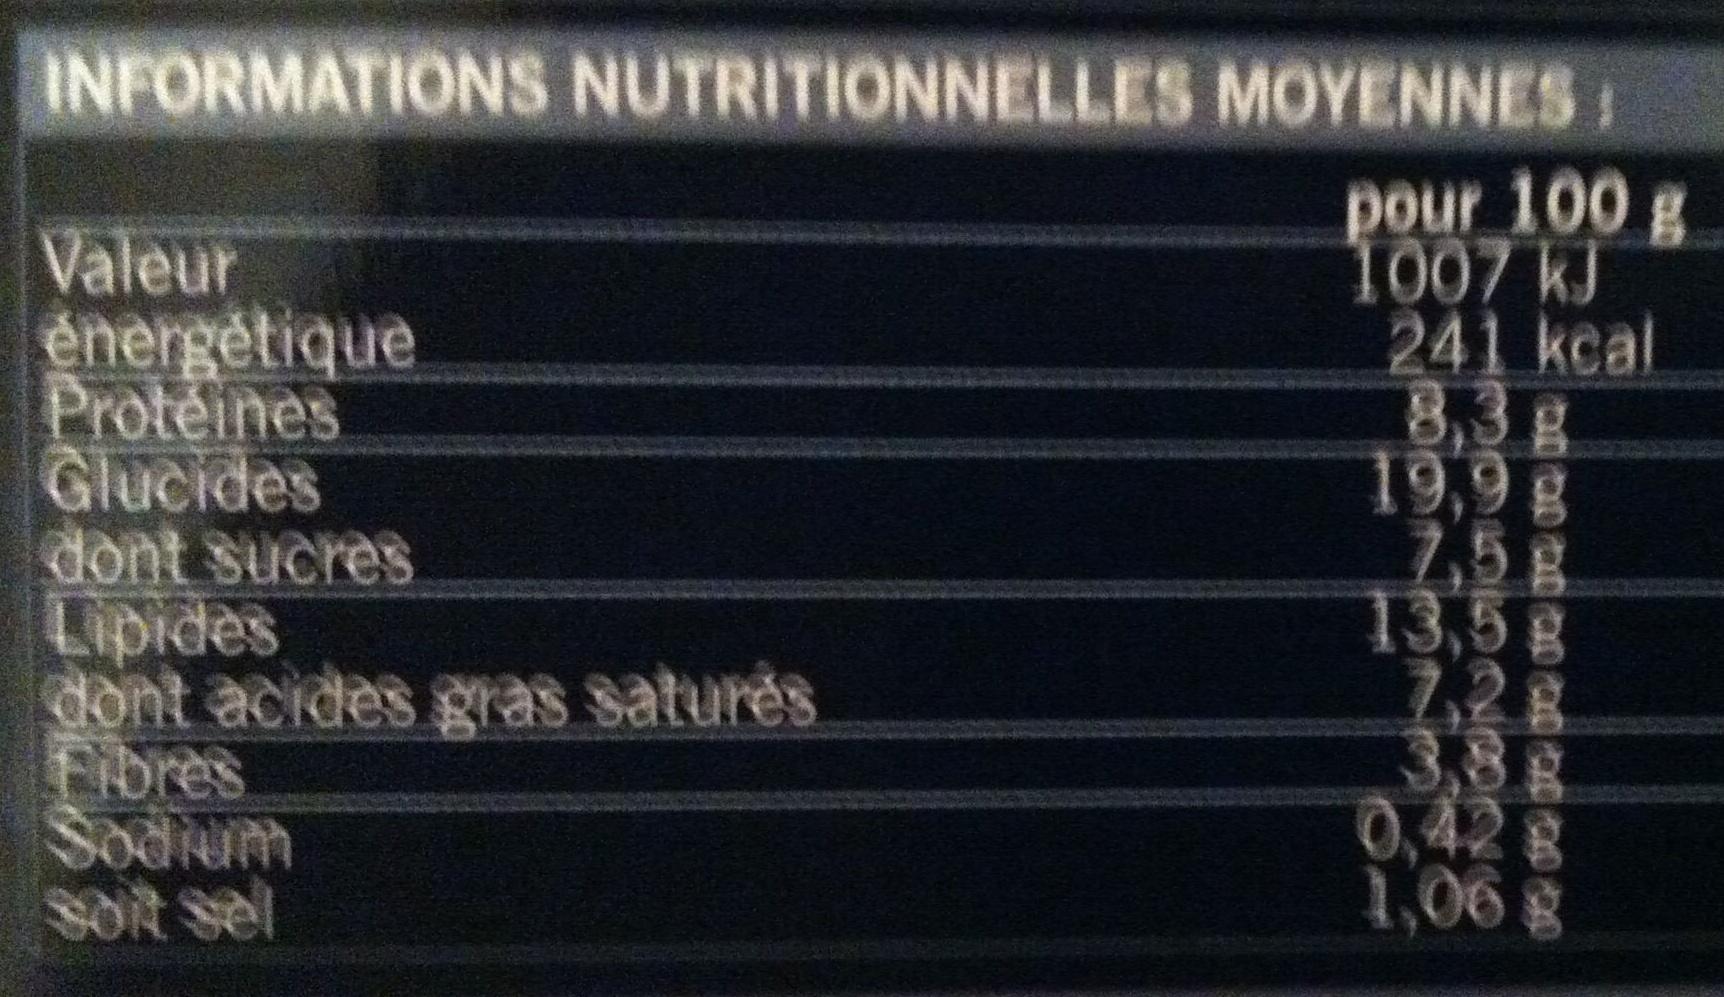 12 Tartines apéritives - Nutrition facts